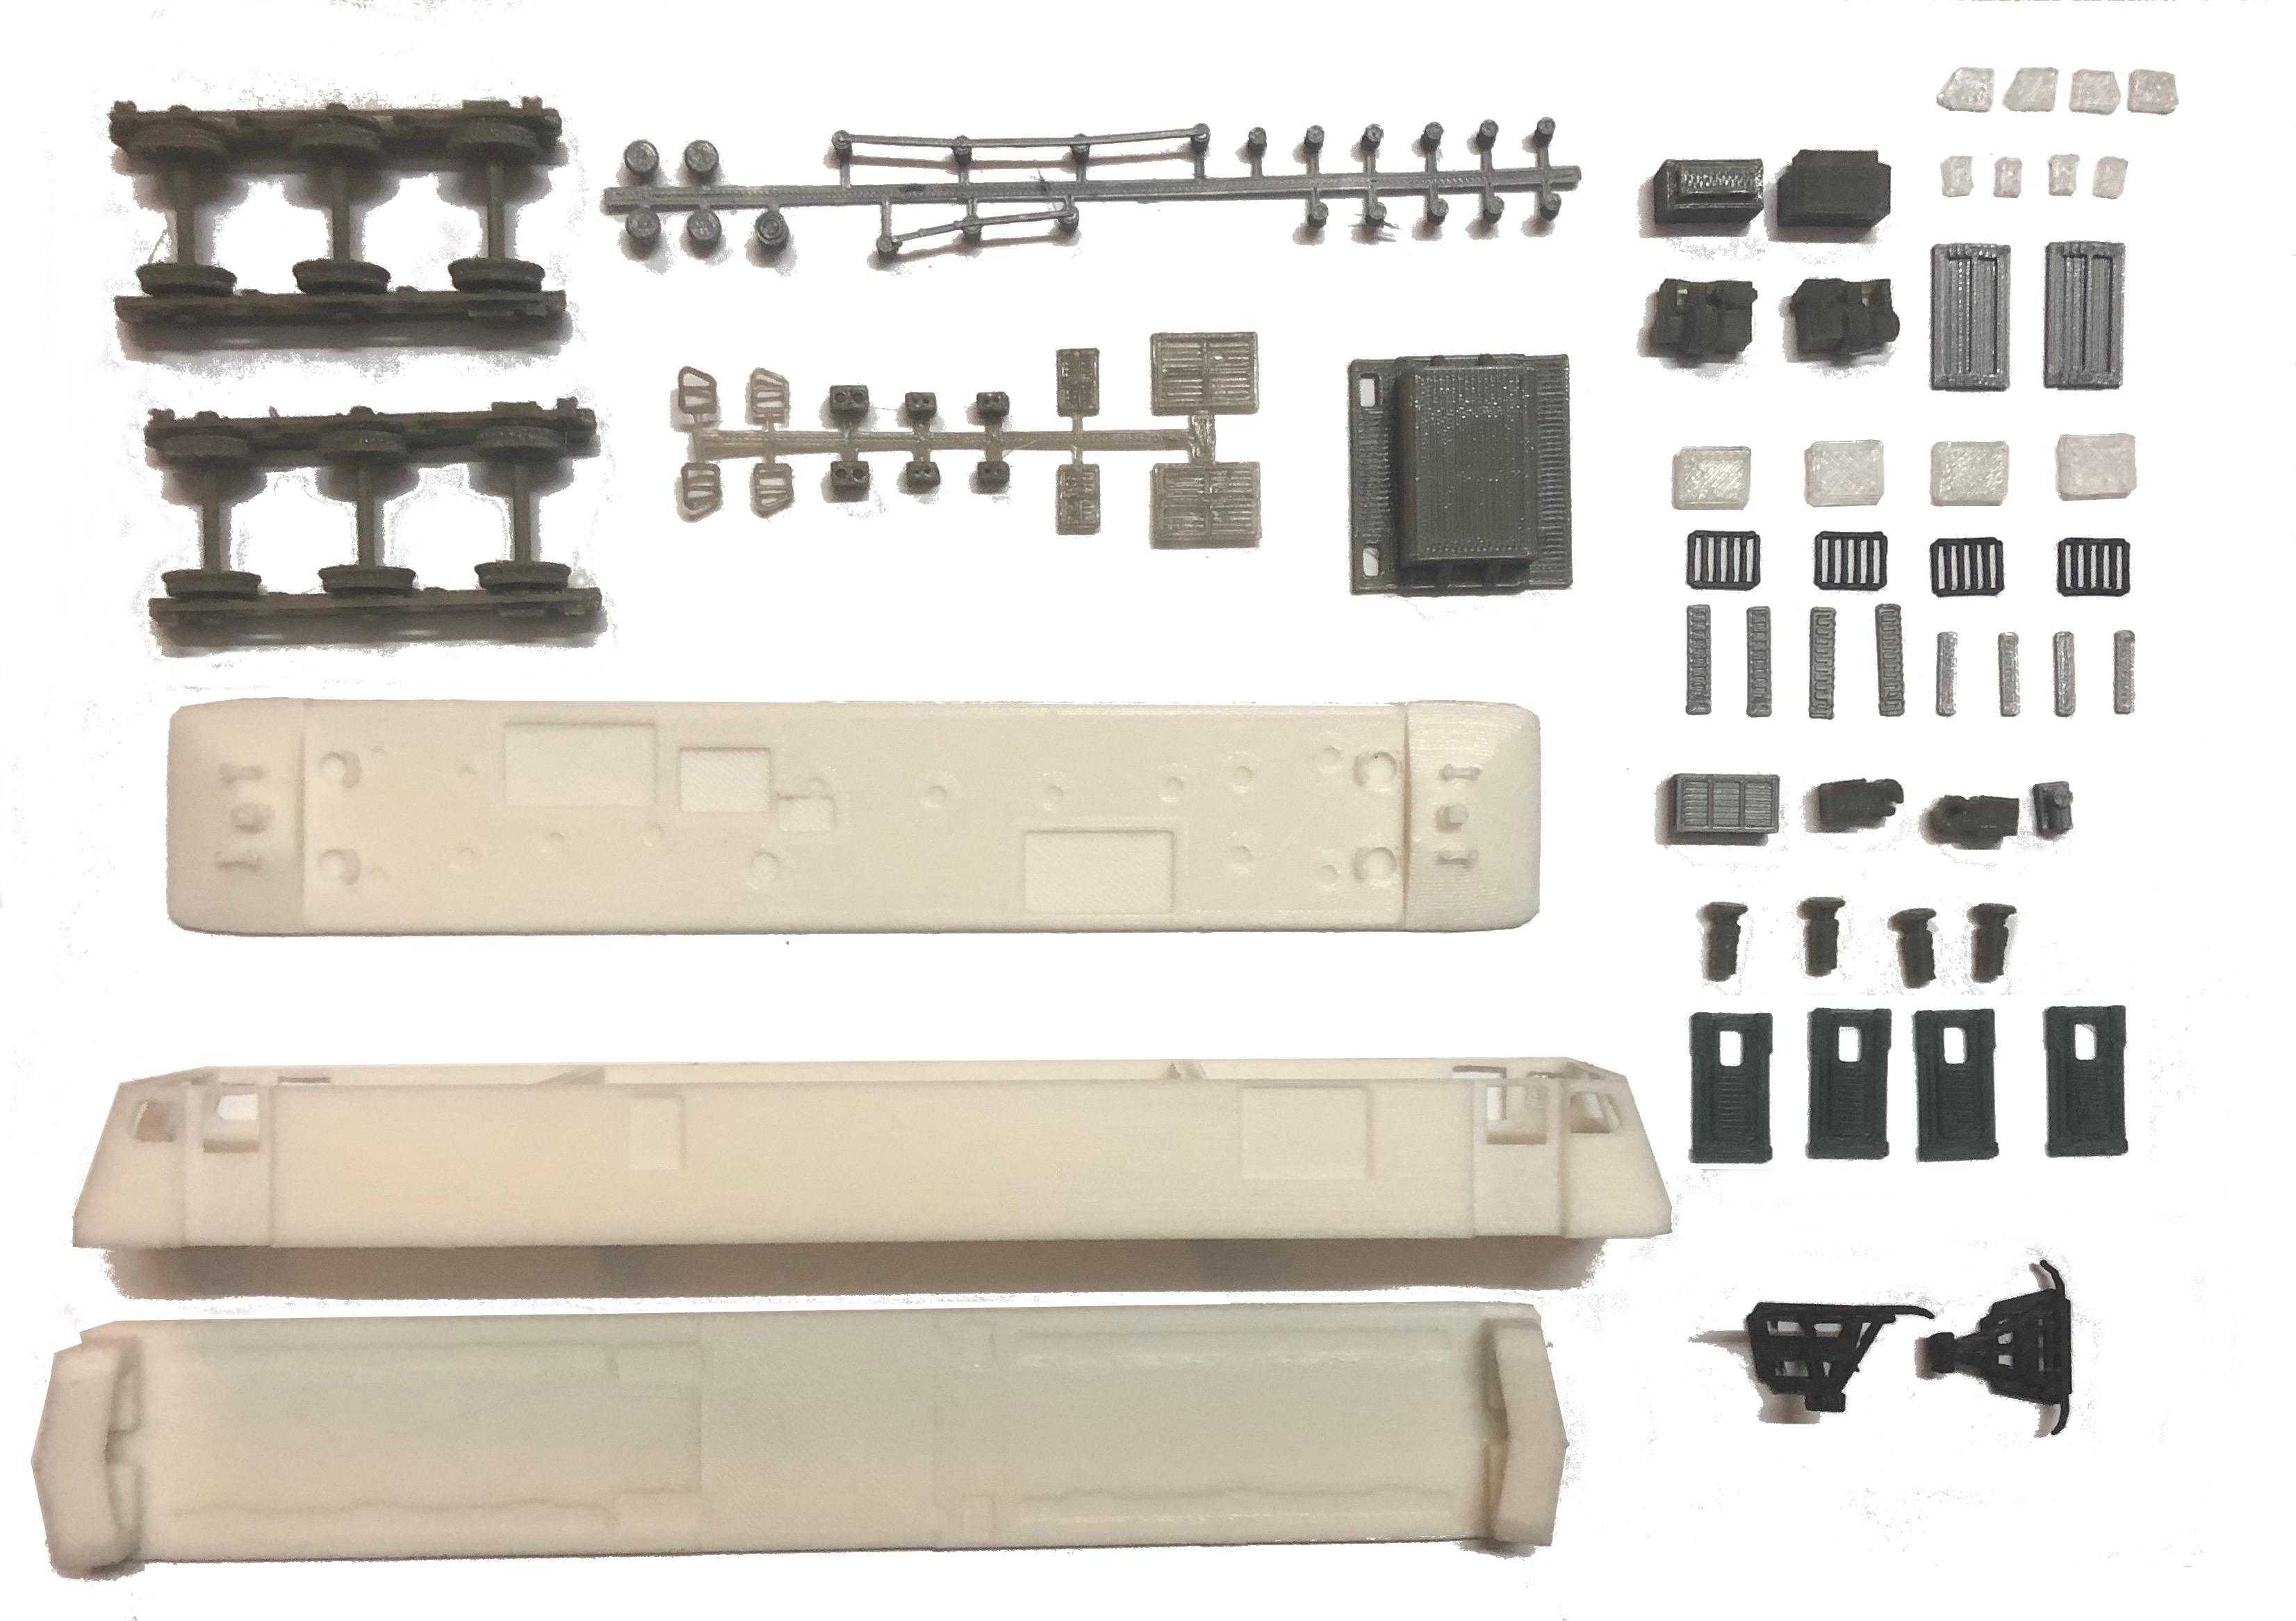 1:100 HO Gauge IR Scale WAG-9 Build Kit (Economy Edition)